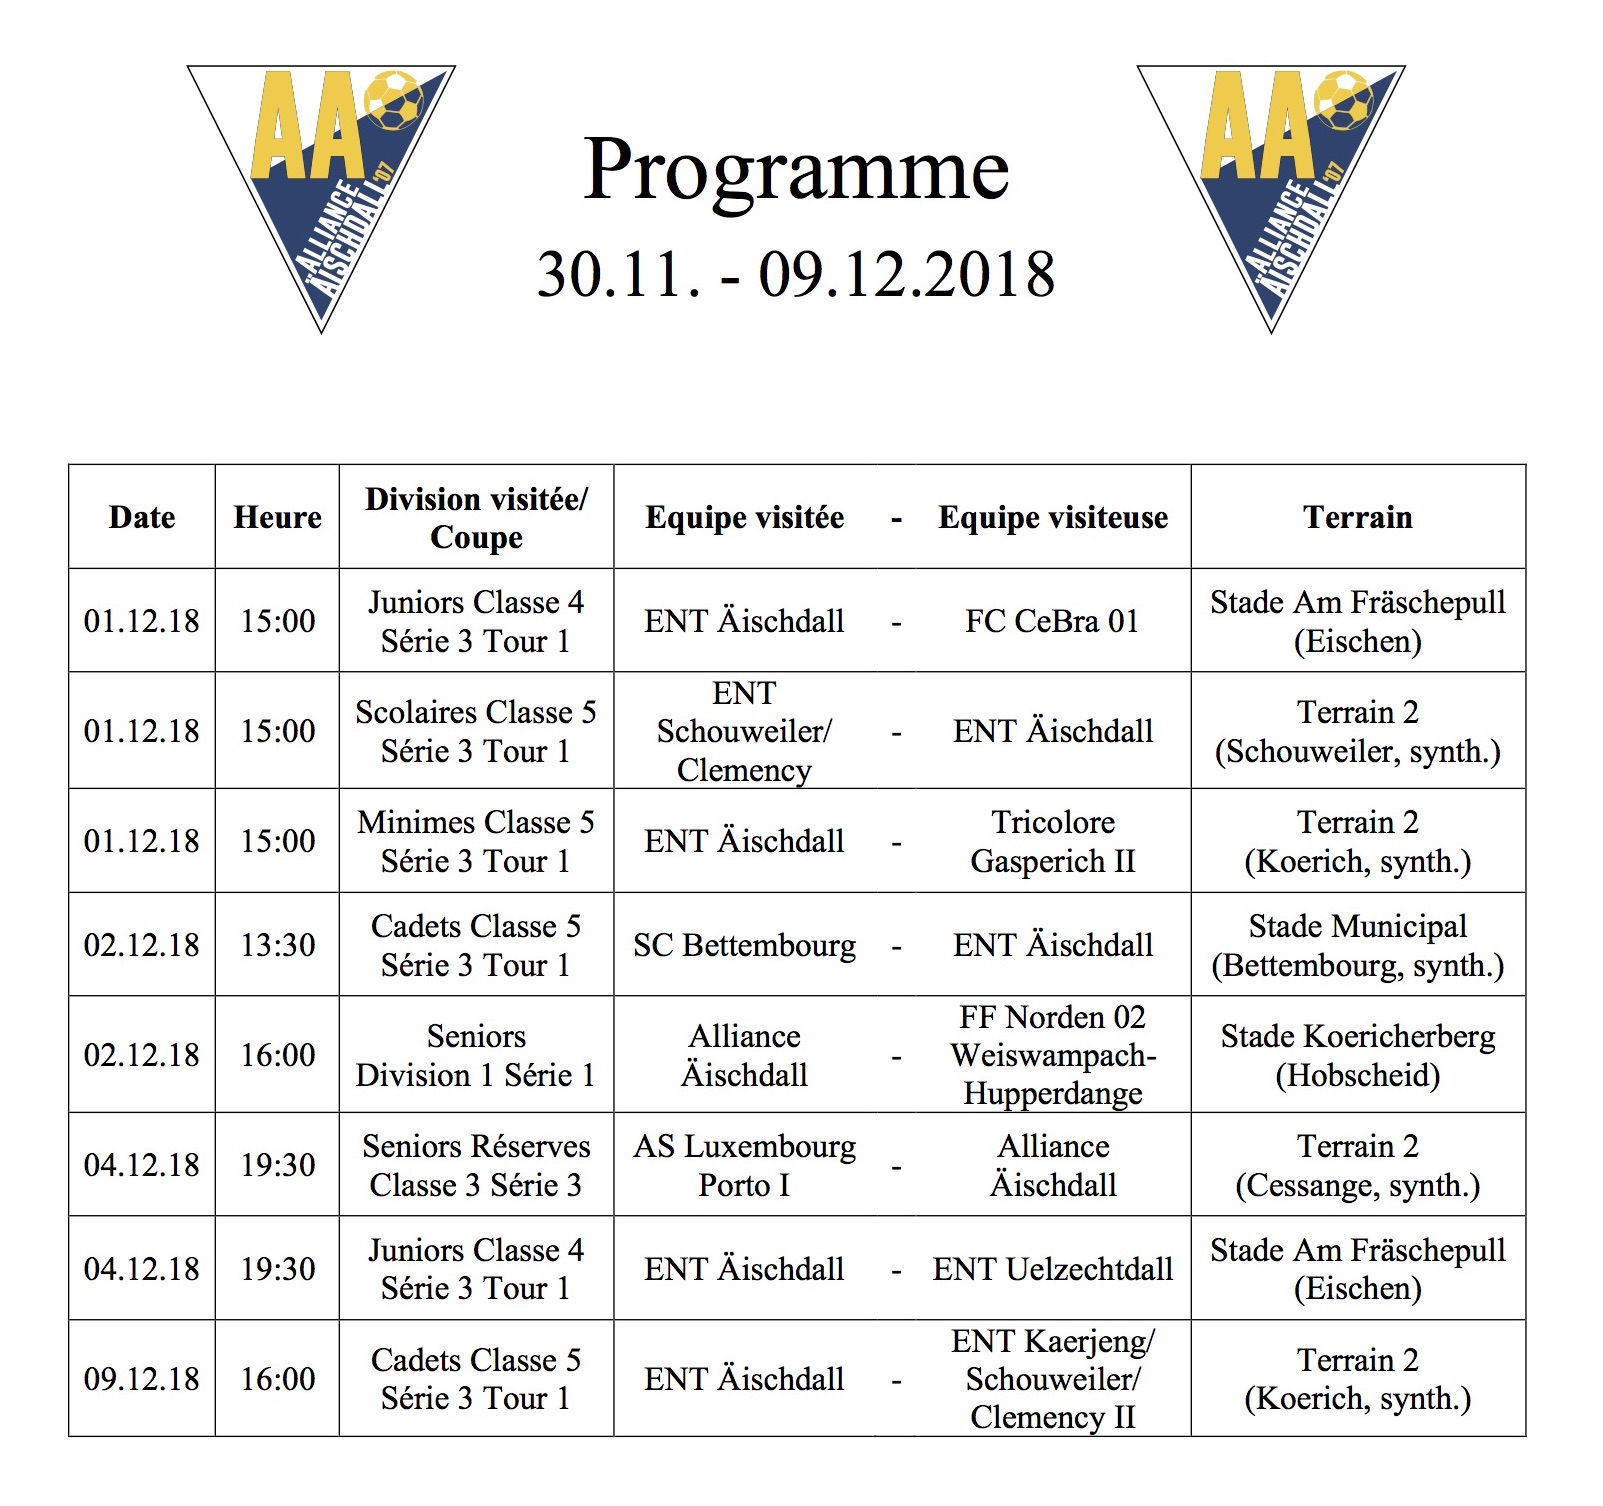 Programm 30.11.-09.12.2018